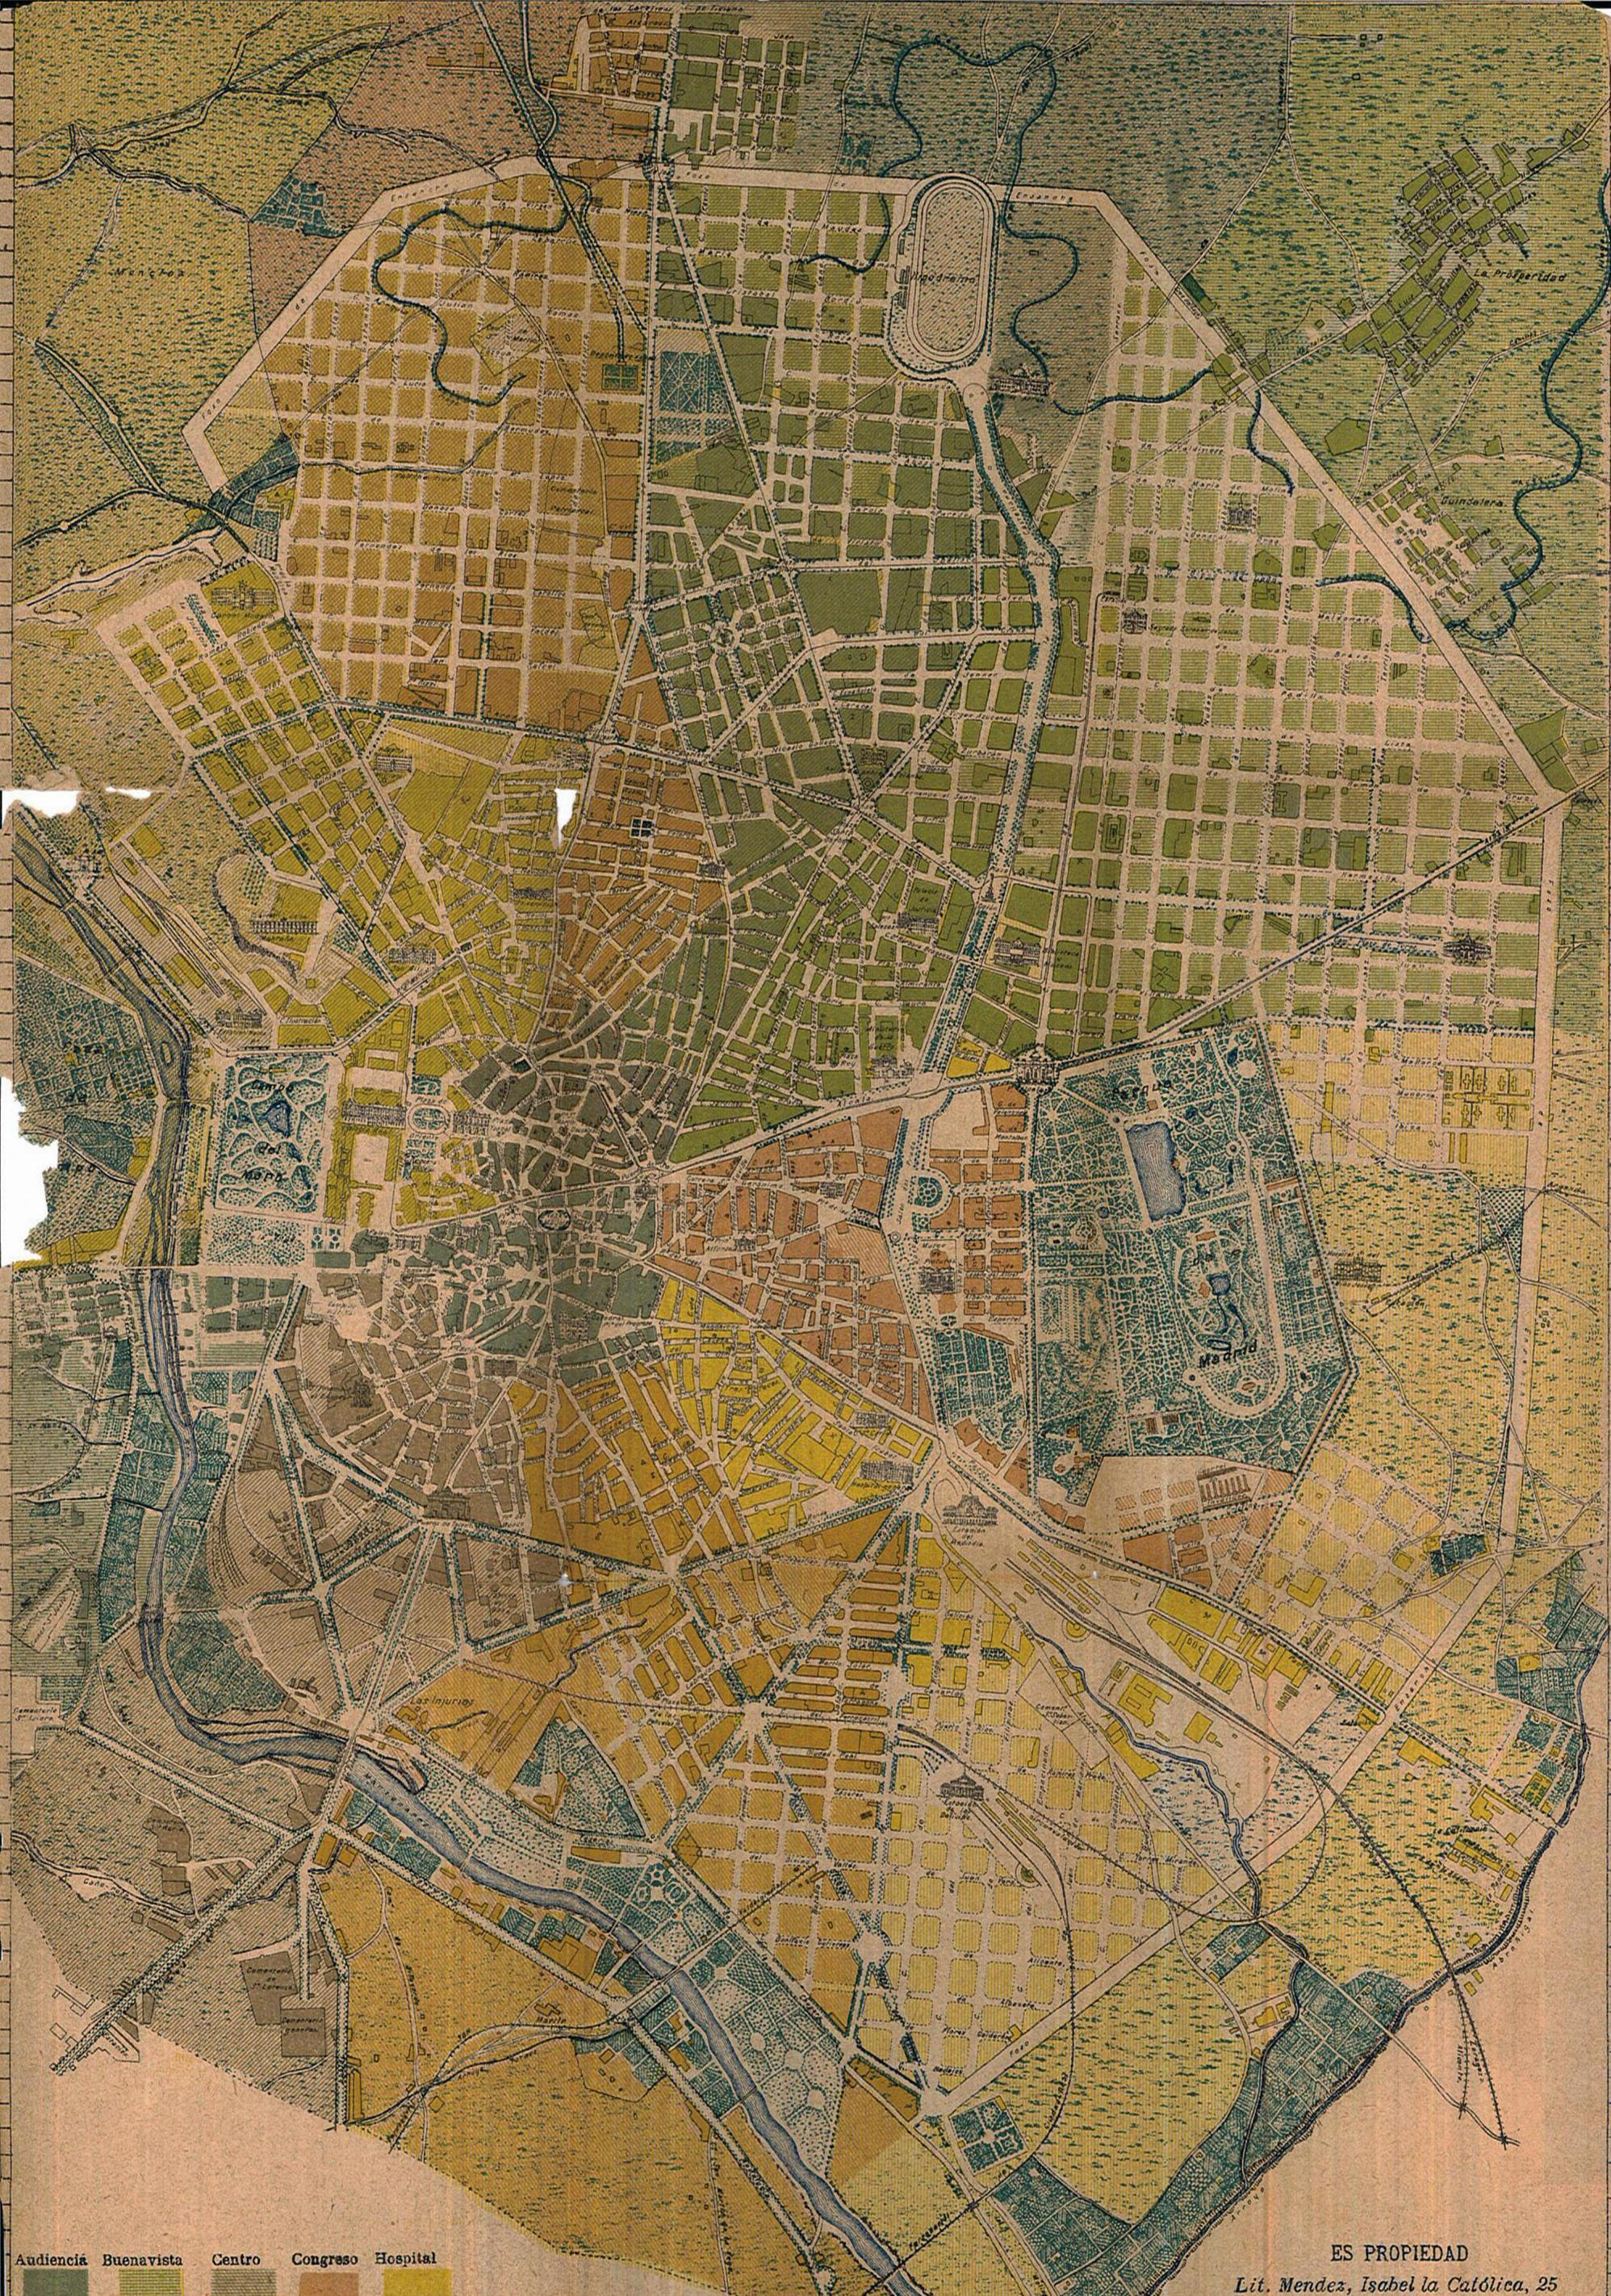 Madrid map of 1902